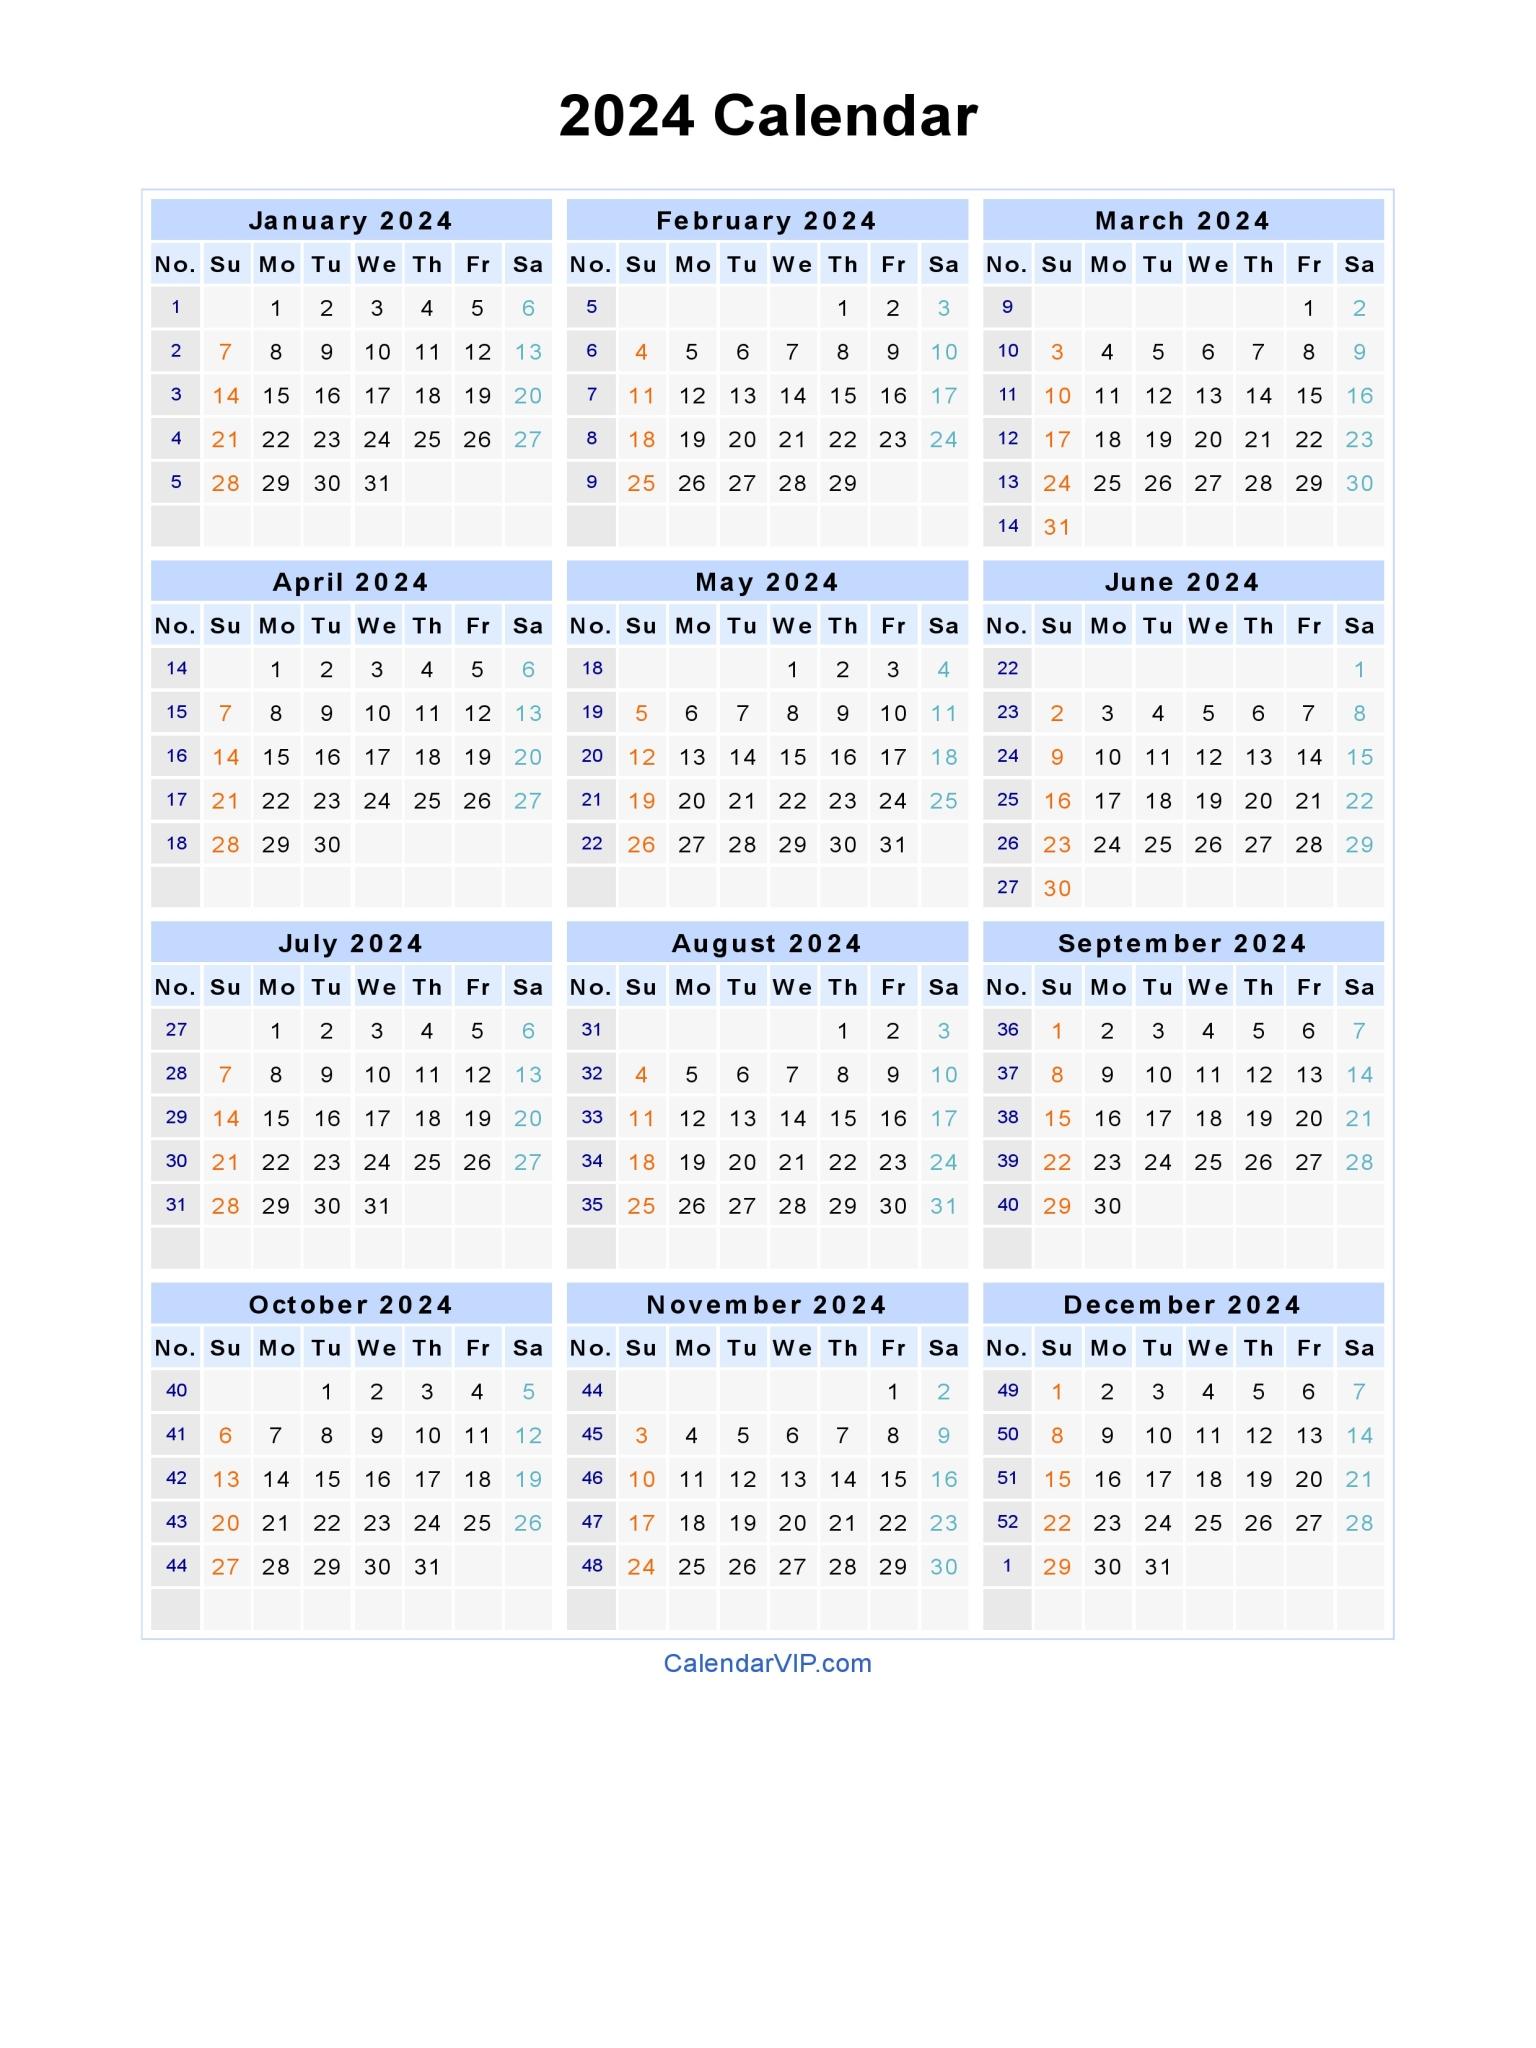 2024 calendar